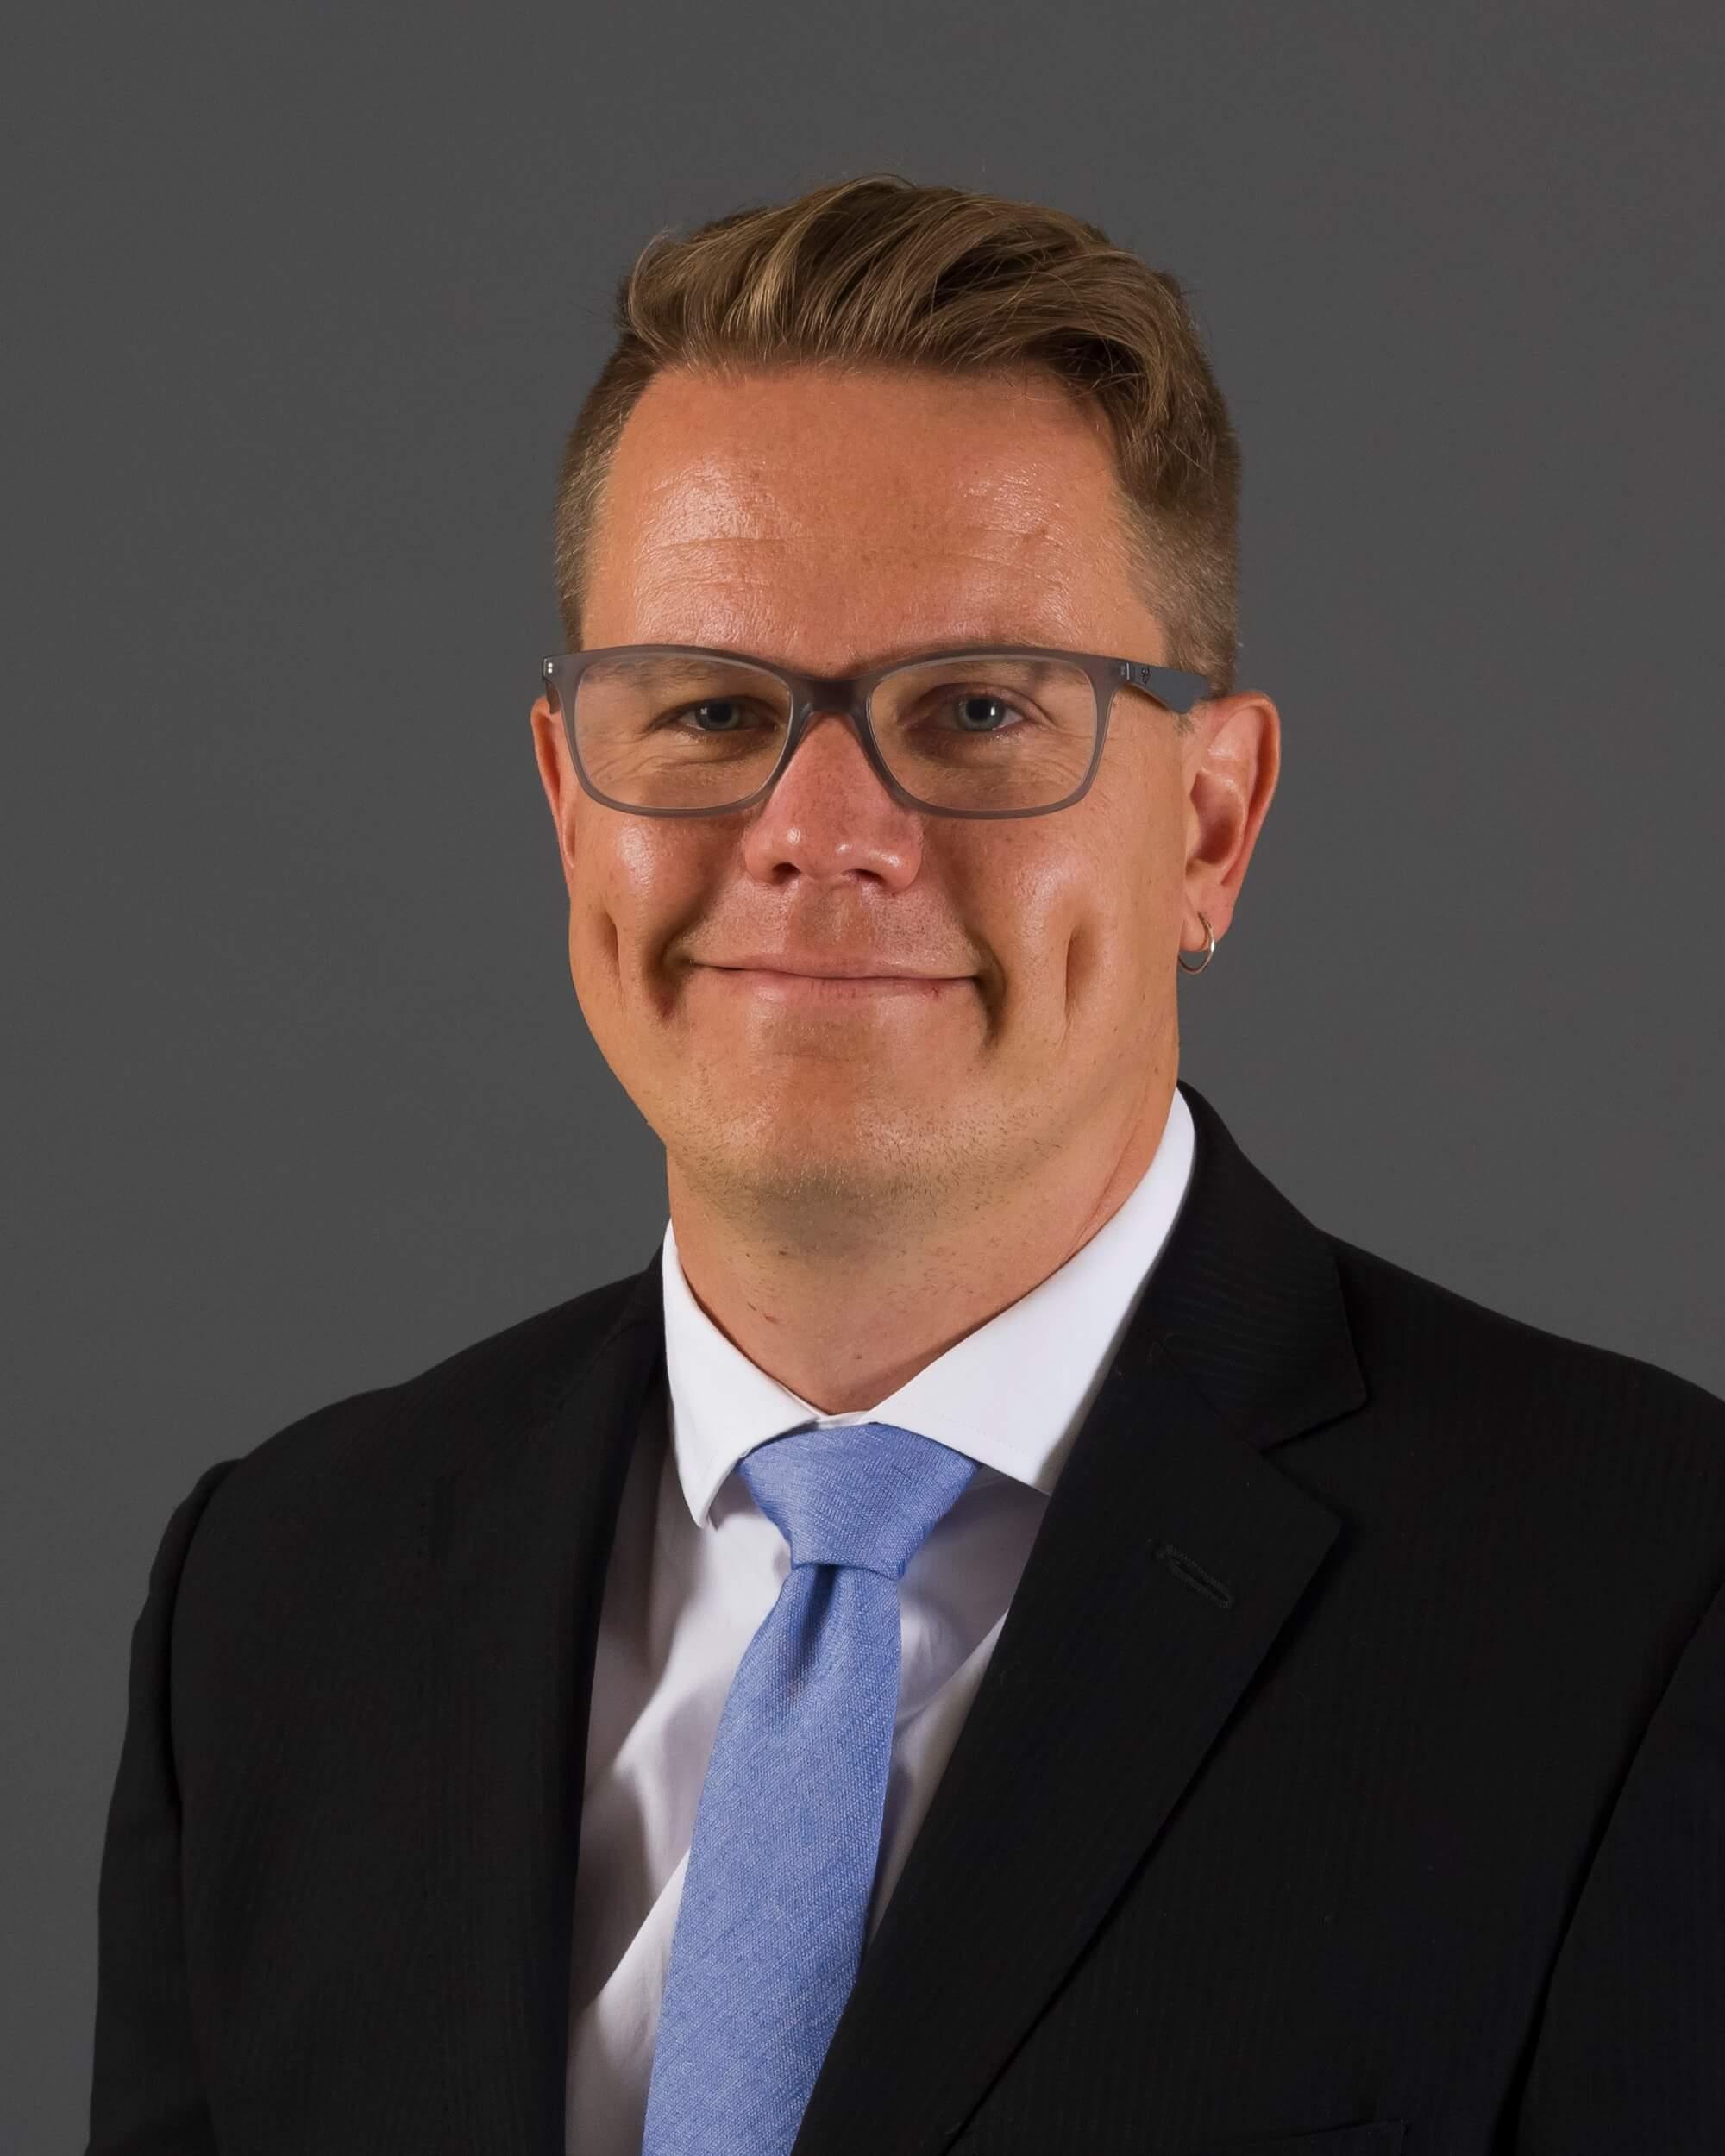 Markus Moos profile picture